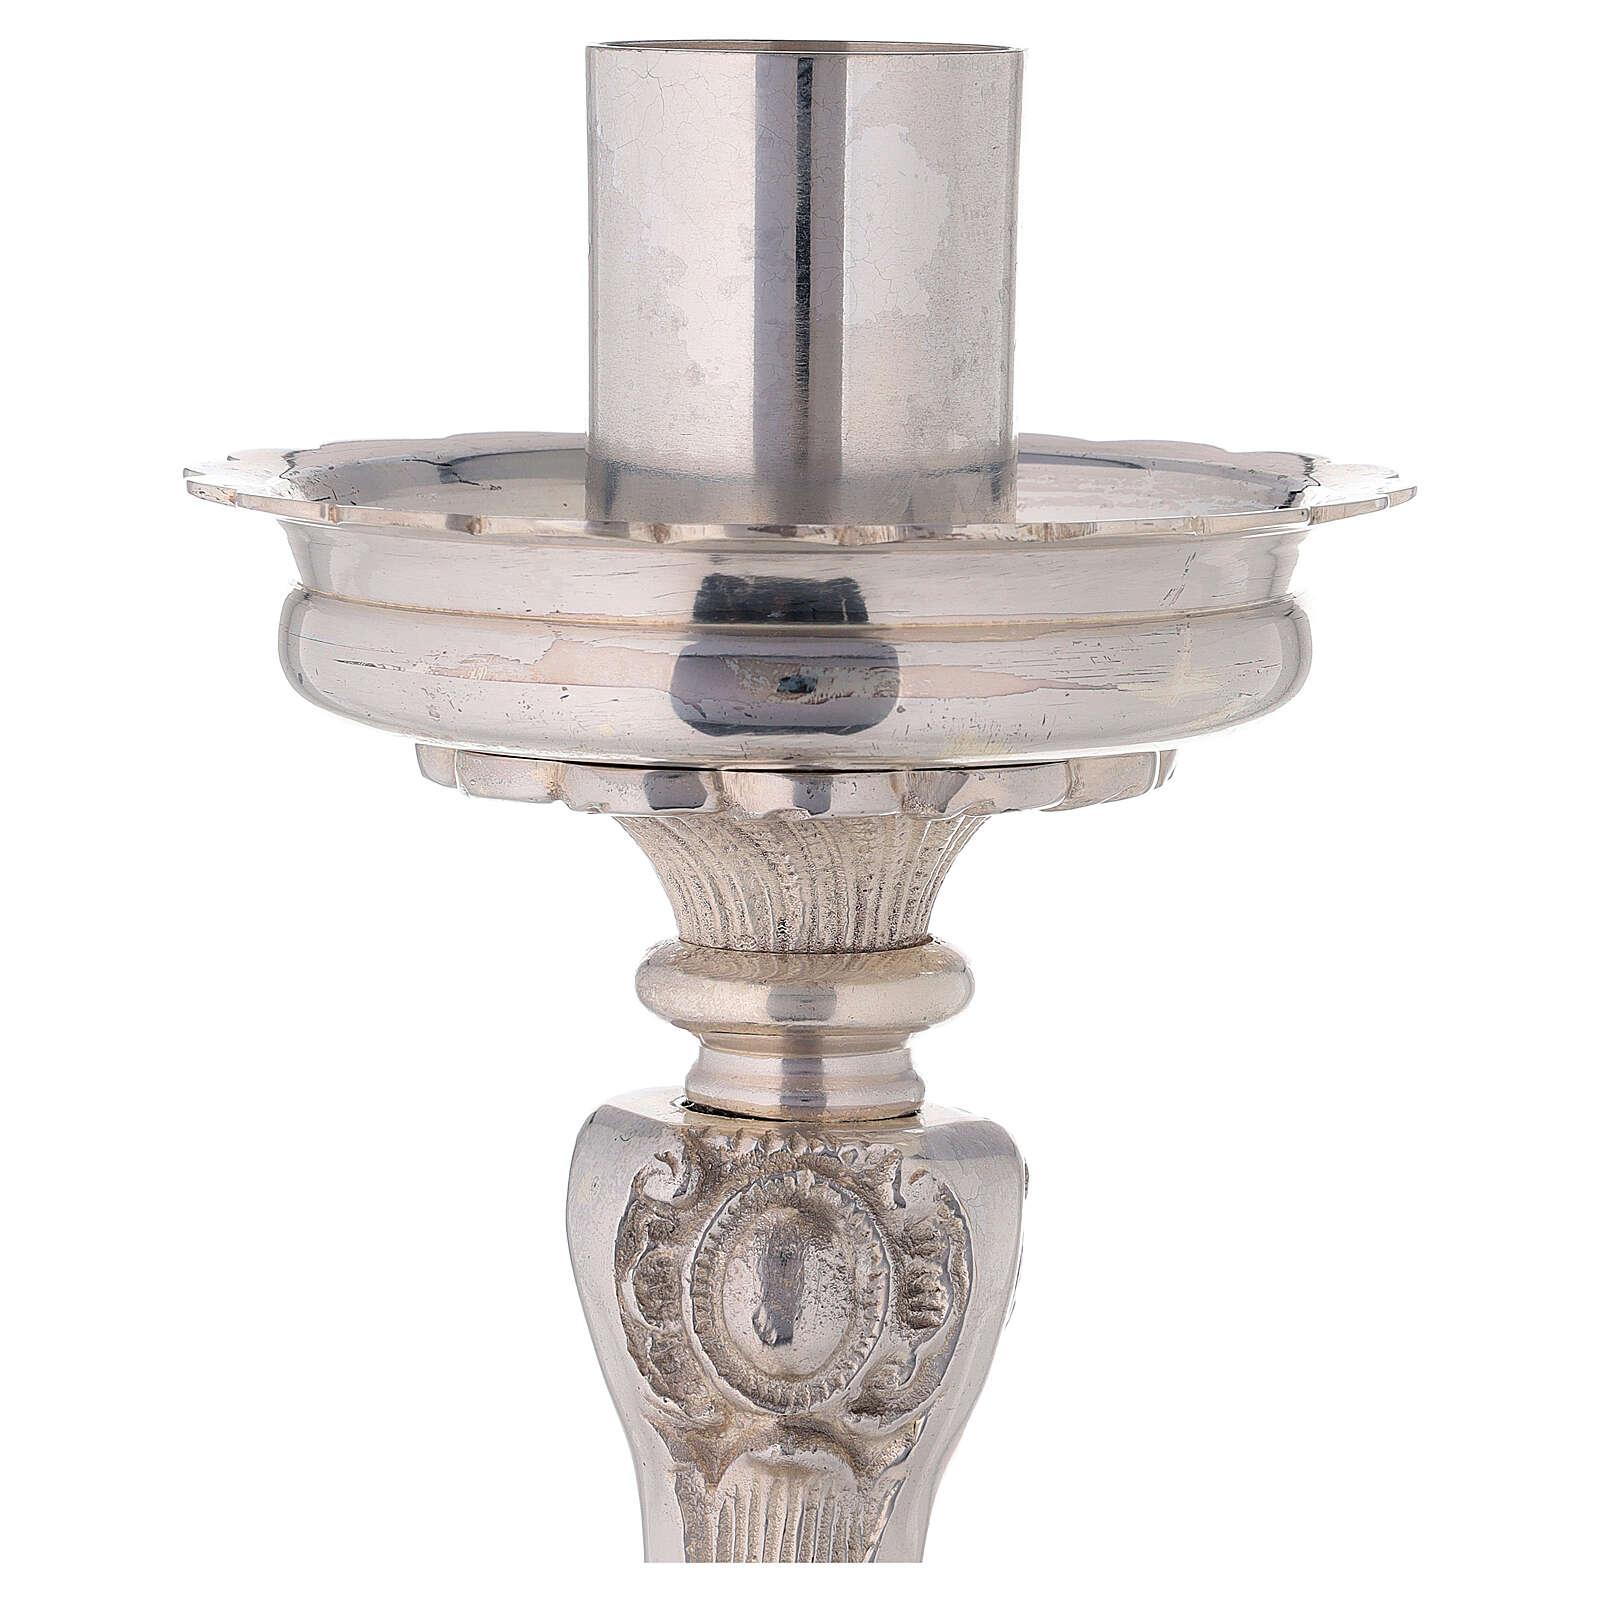 Candelero de altar latón plateado trípode h 39 cm 4